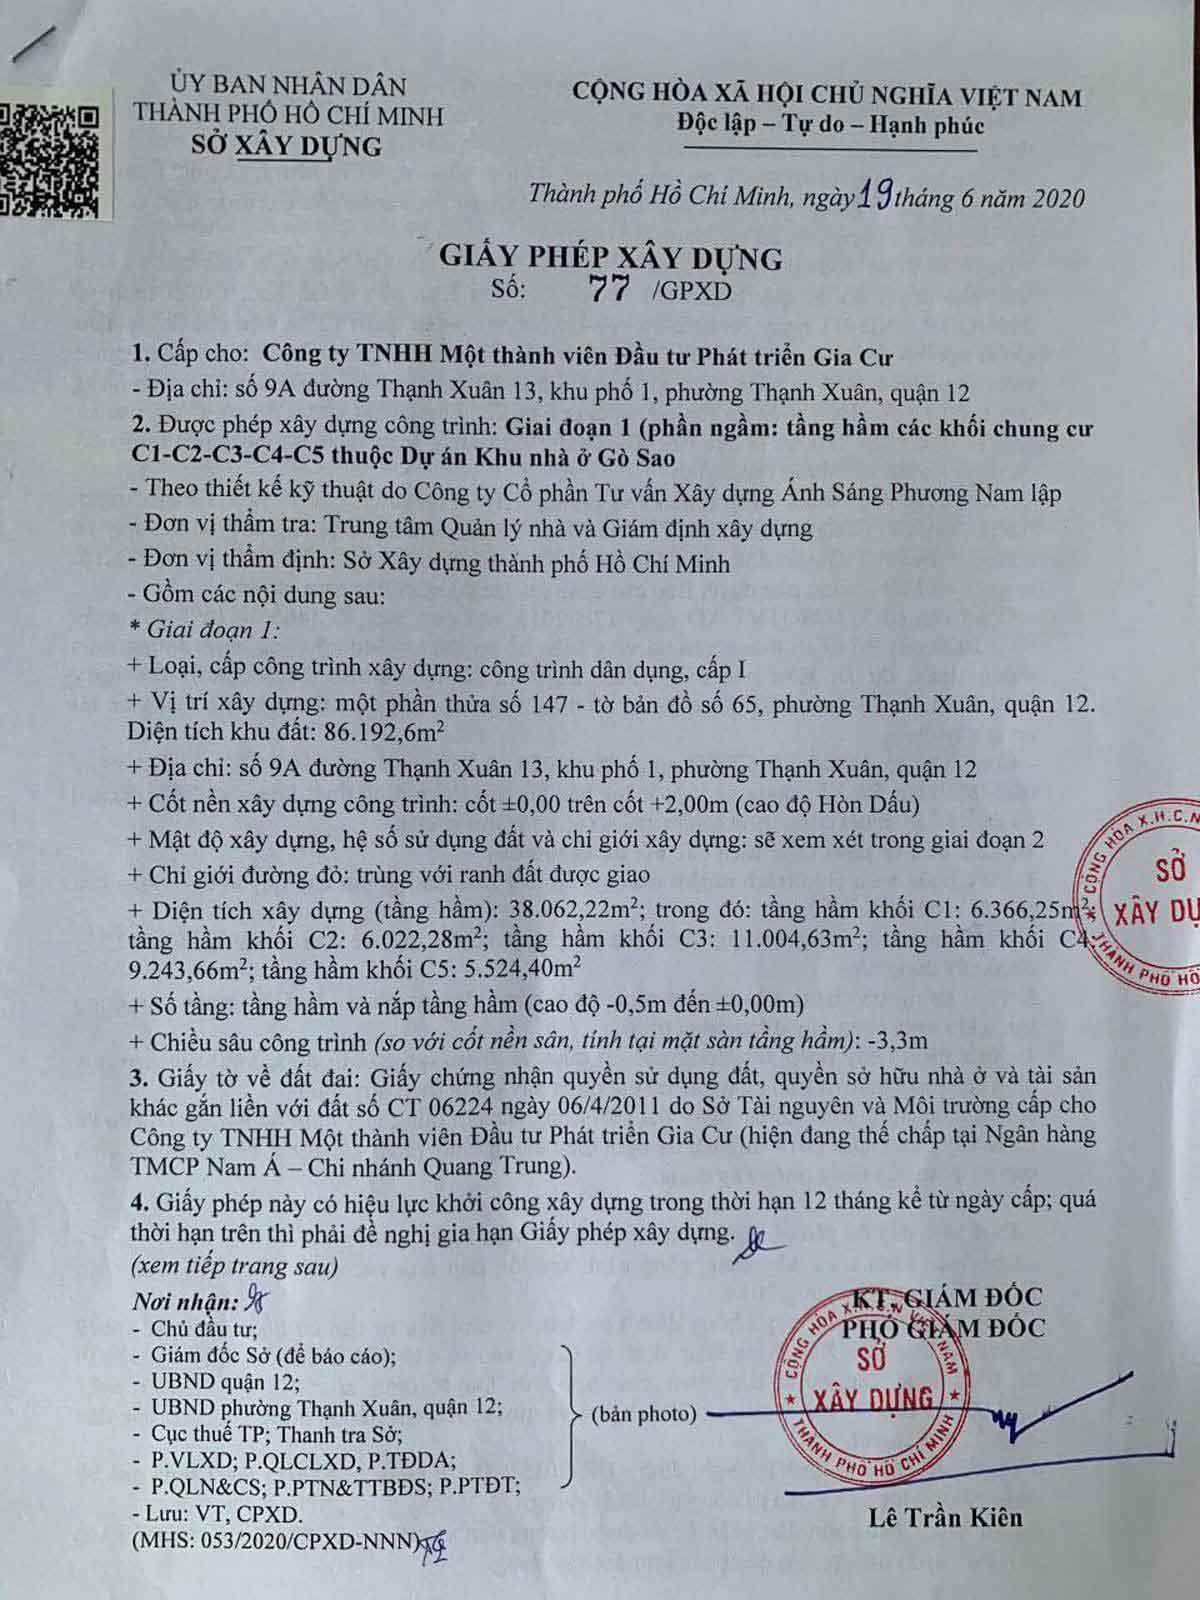 giay phep xay dung phan ngam du an picity high park 2020 - Pháp lý Dự án Căn hộ Picity High Park Quận 12